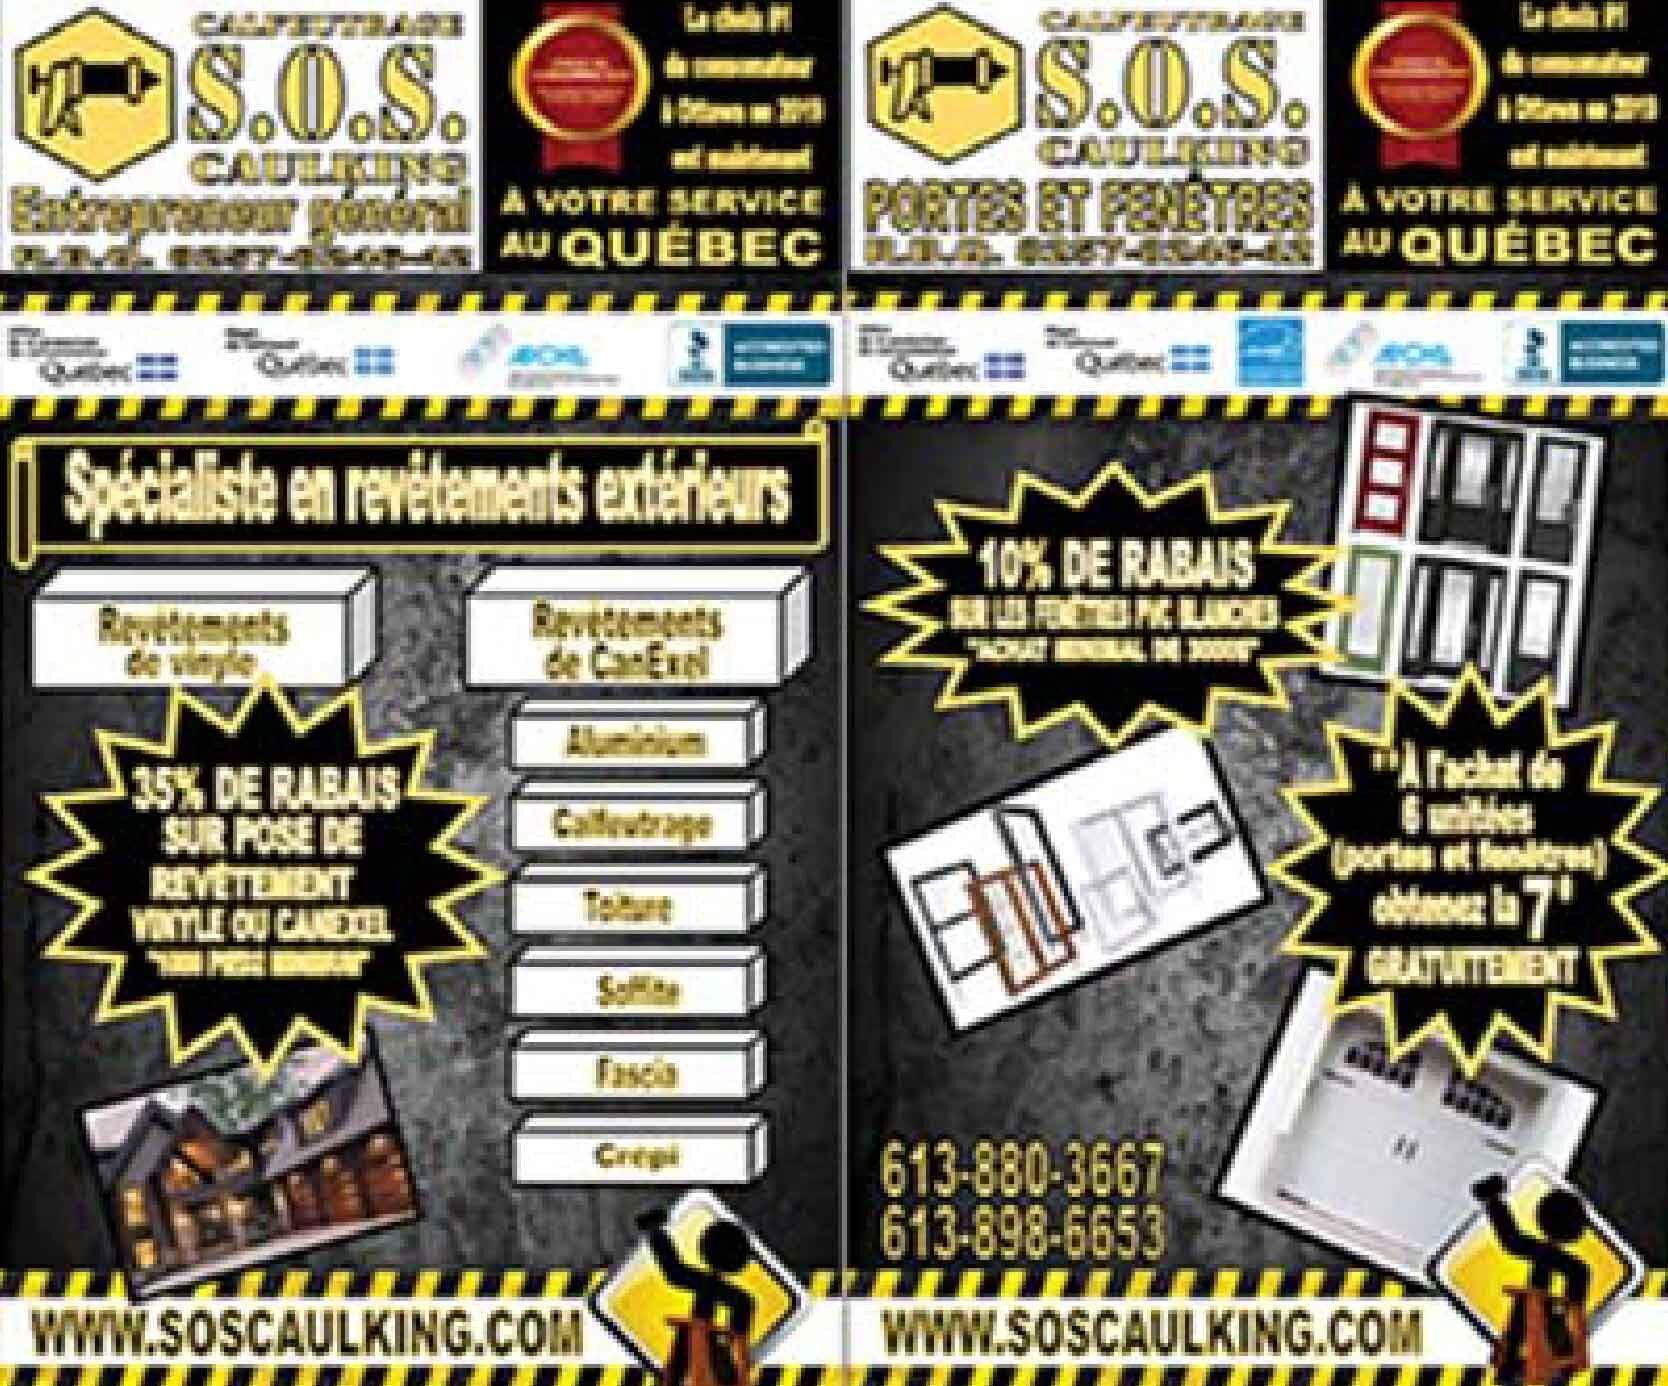 SOS-Caulking-Promotion-2.jpg